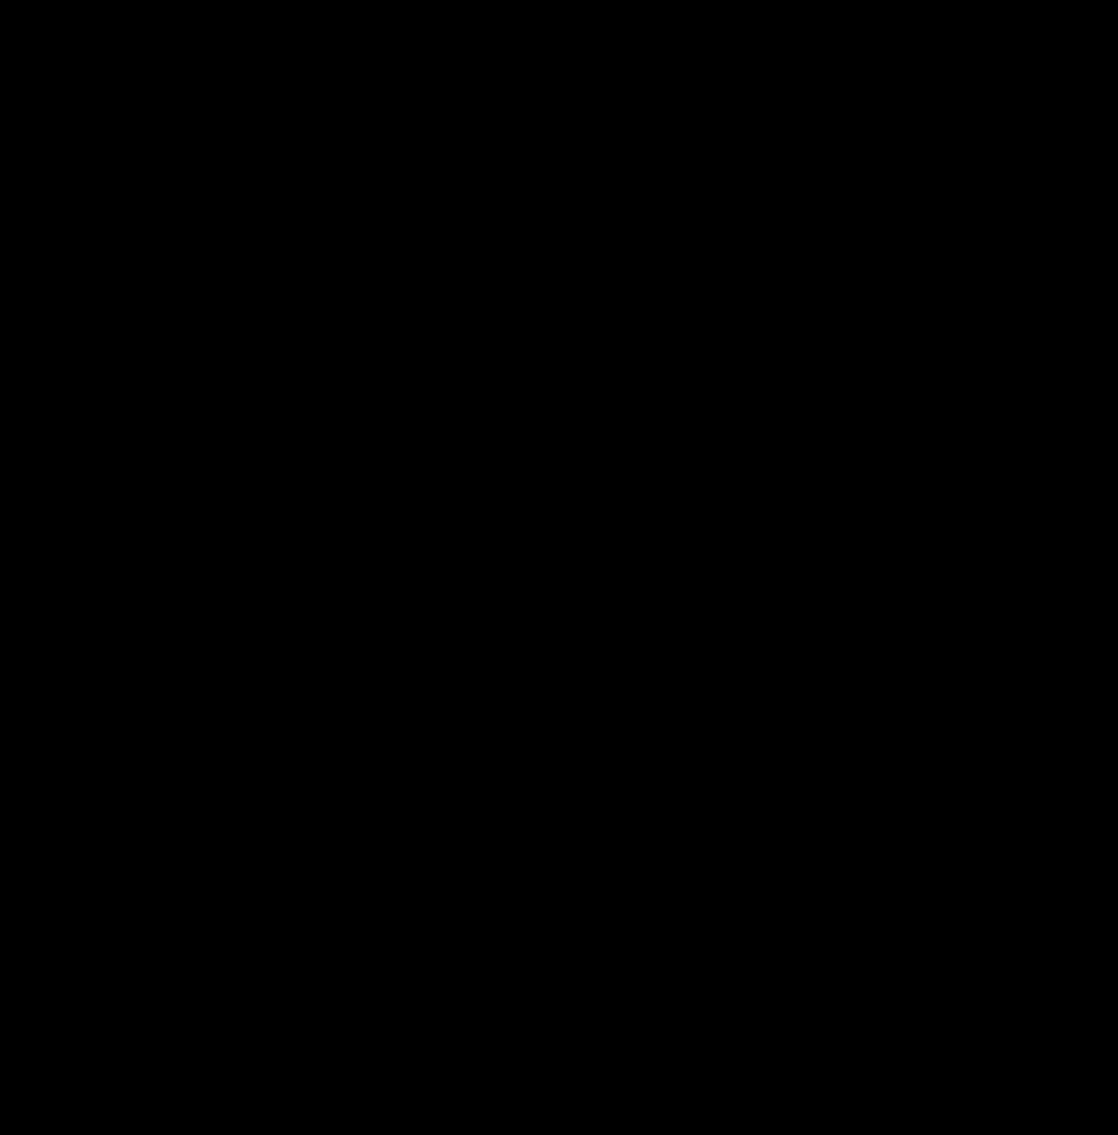 Planet Pluto Clipart